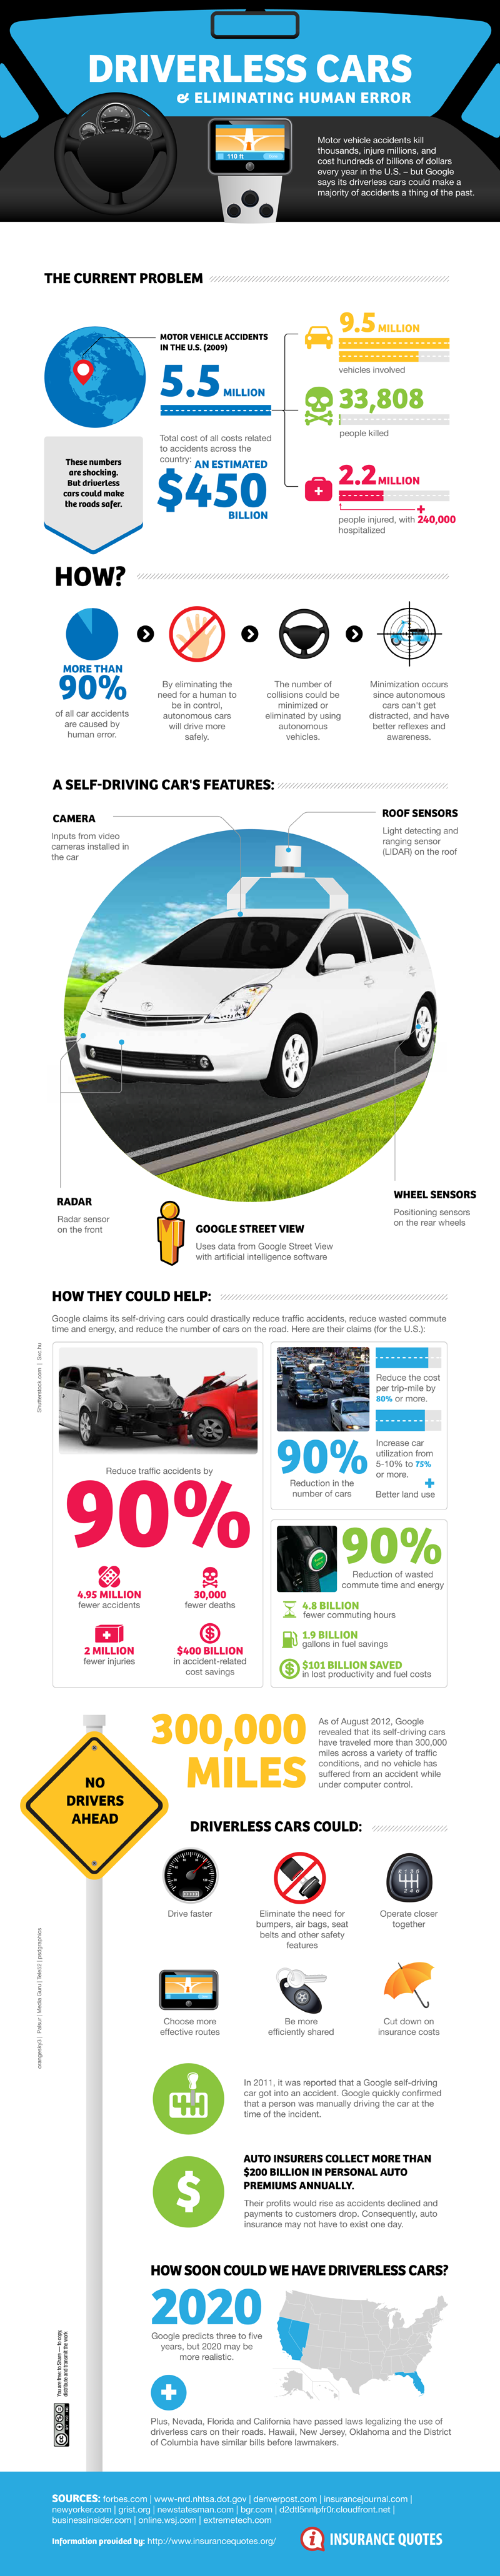 Driverless-Cars-800